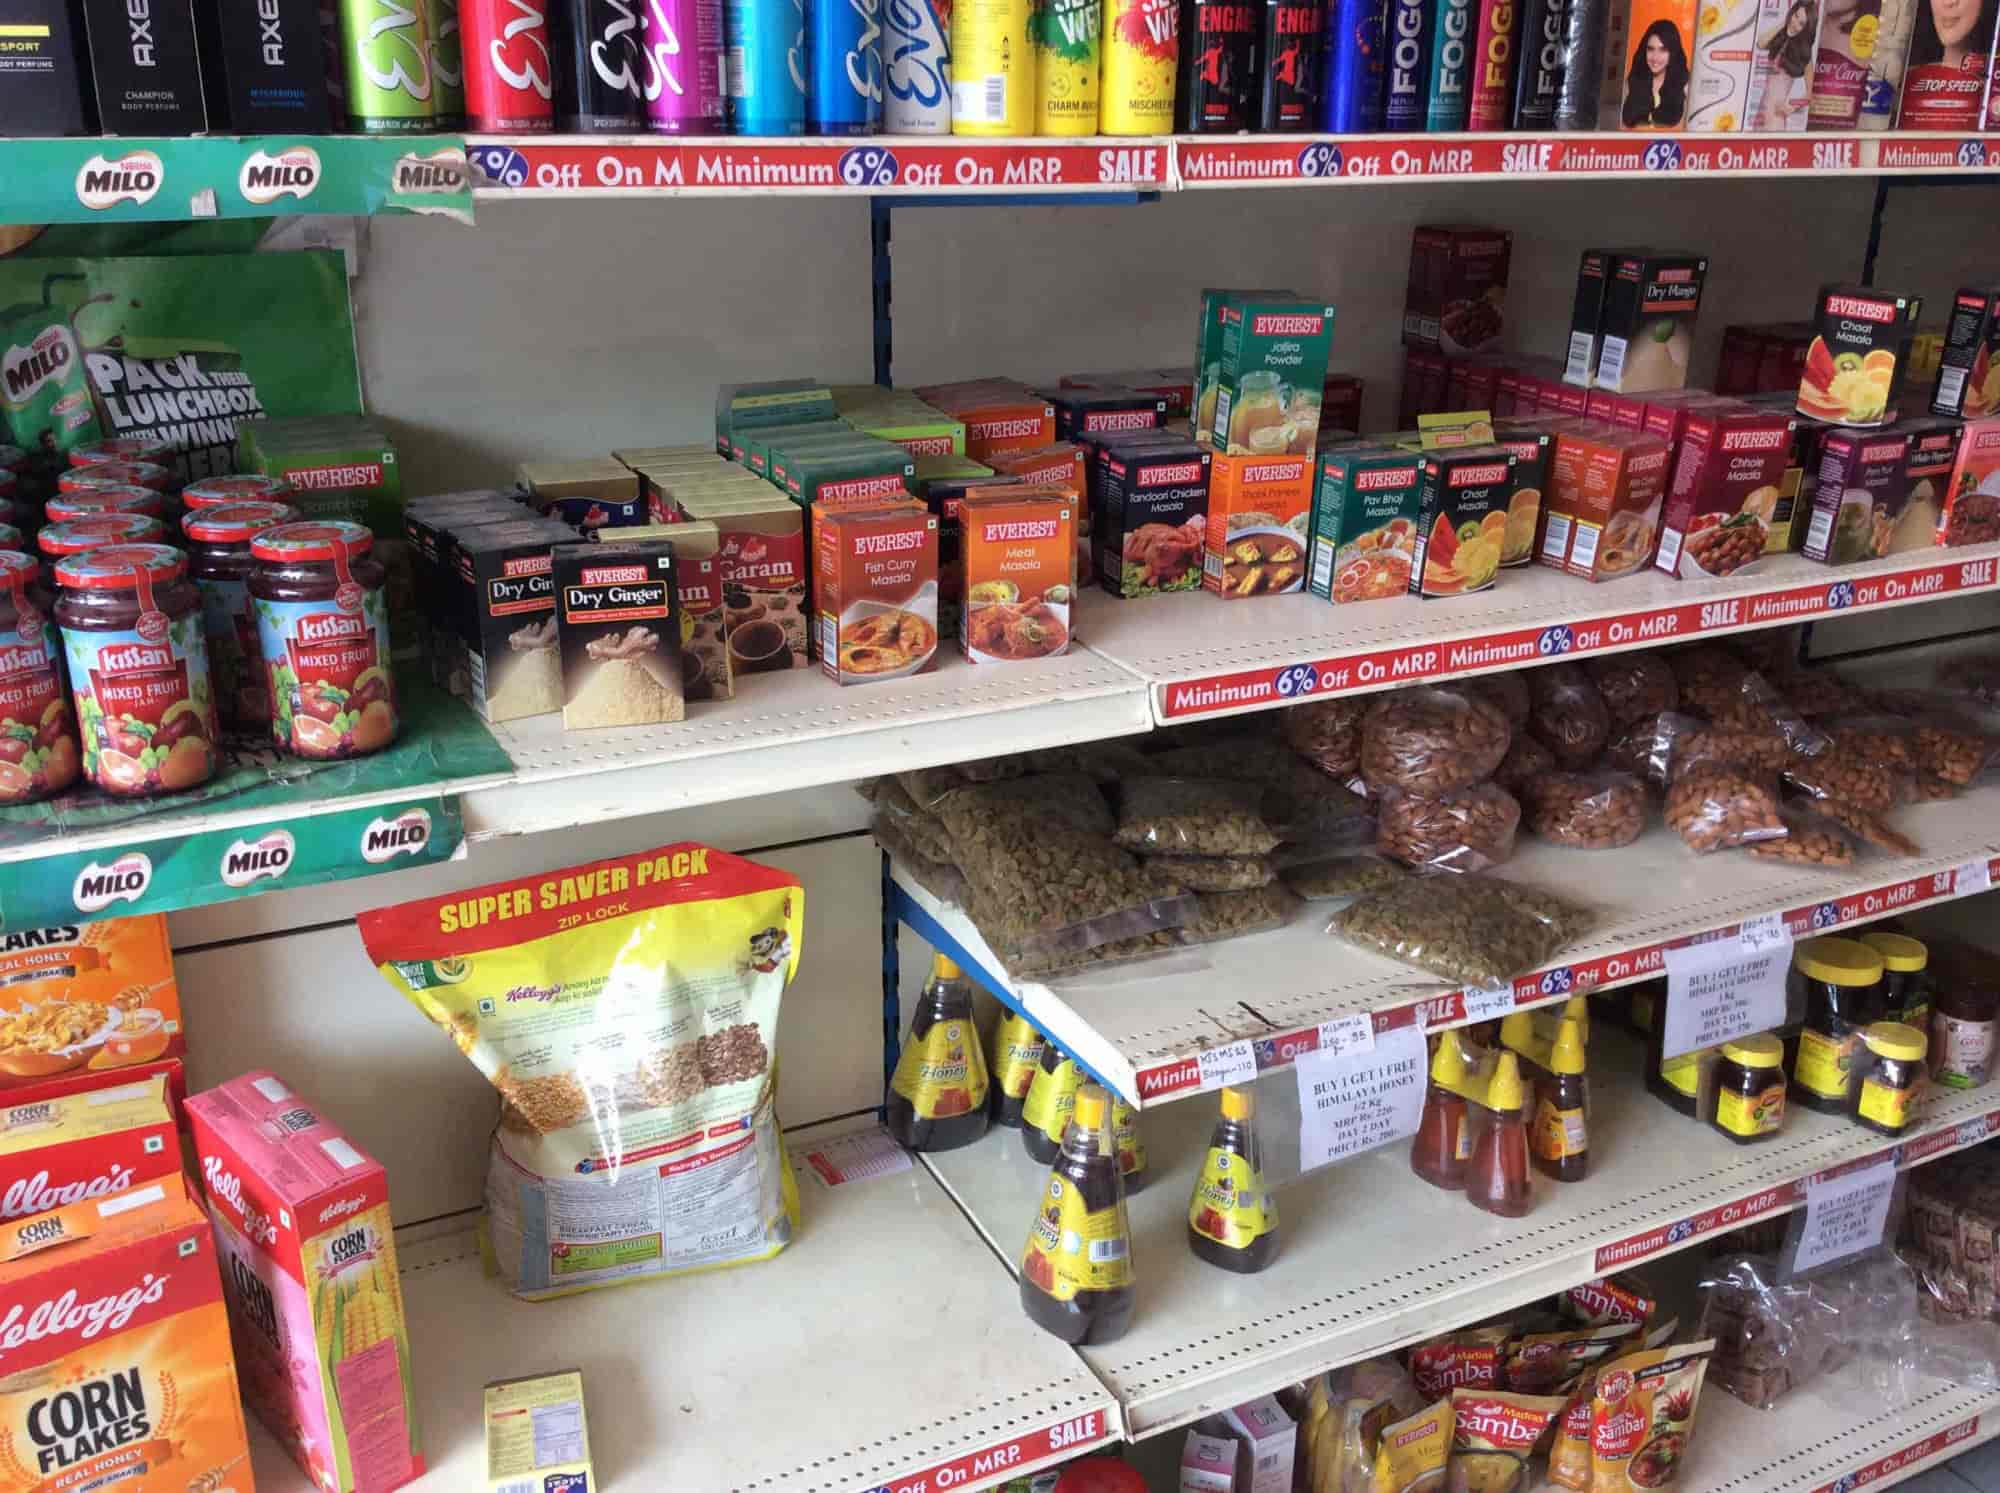 Day 2 Day Wholesale Supermarket, Kanchan Bagh - Supermarkets